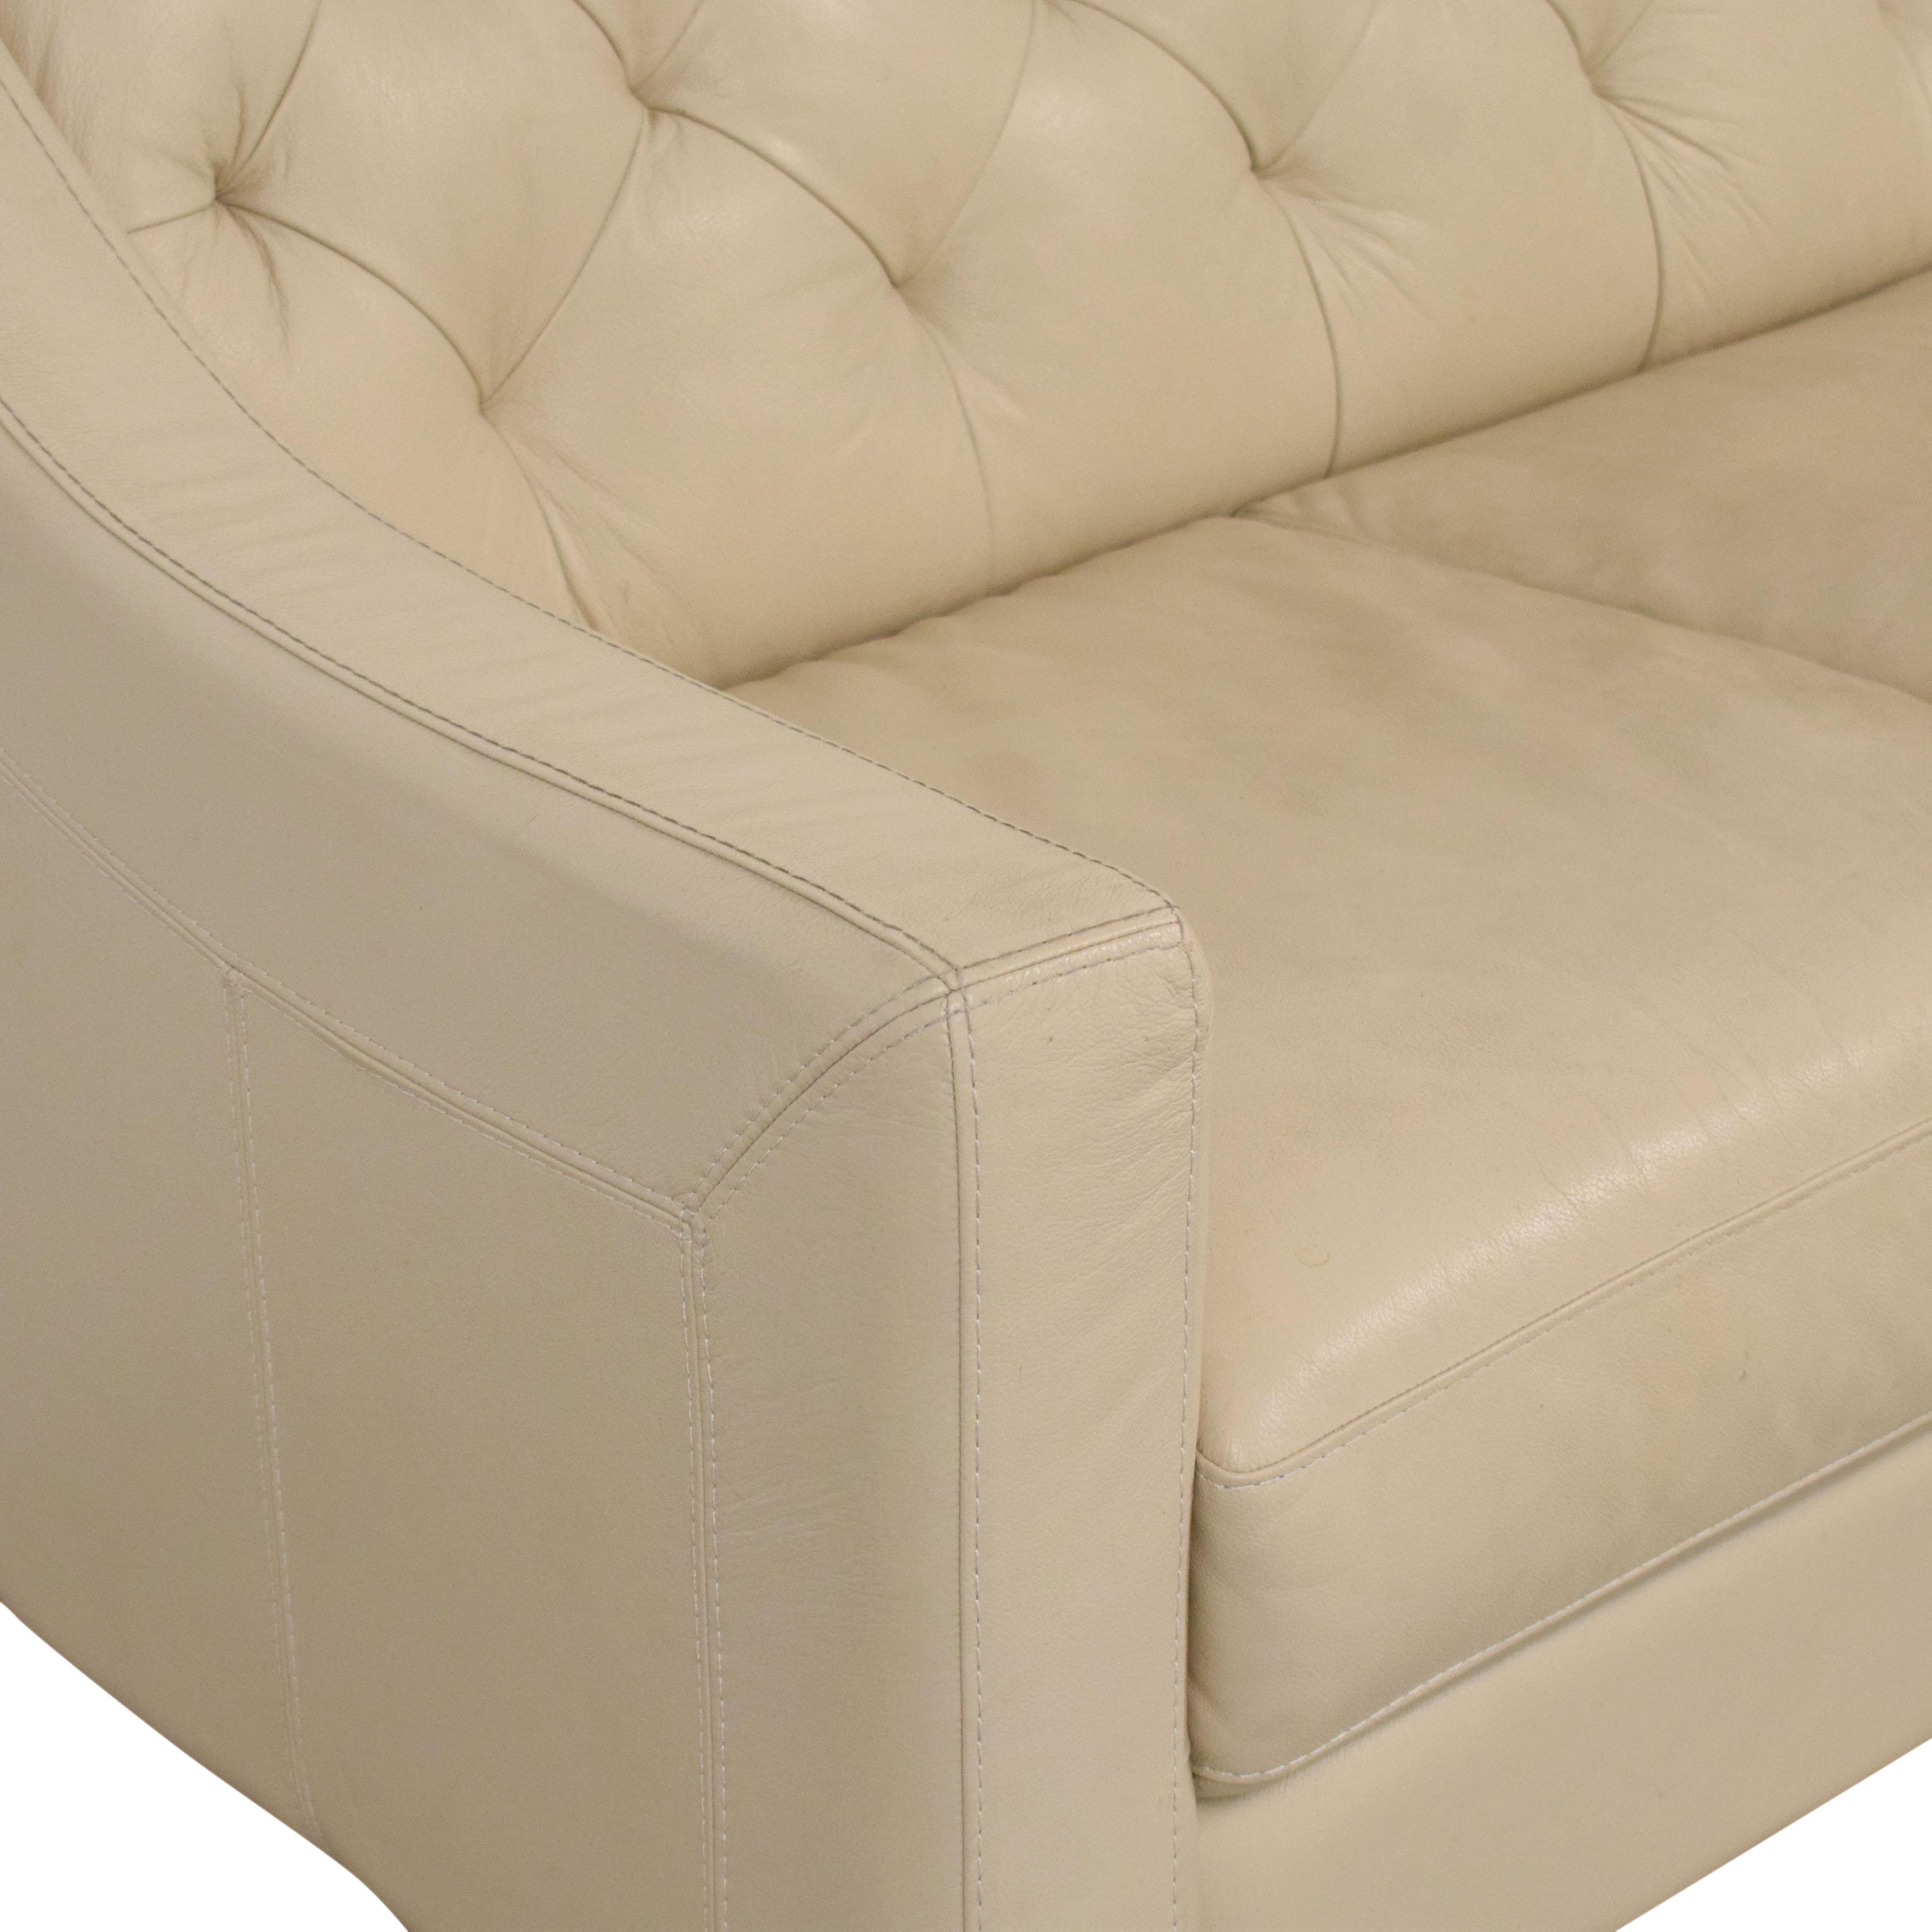 Chateau d'Ax Slope Arm Tufted Sofa / Sofas